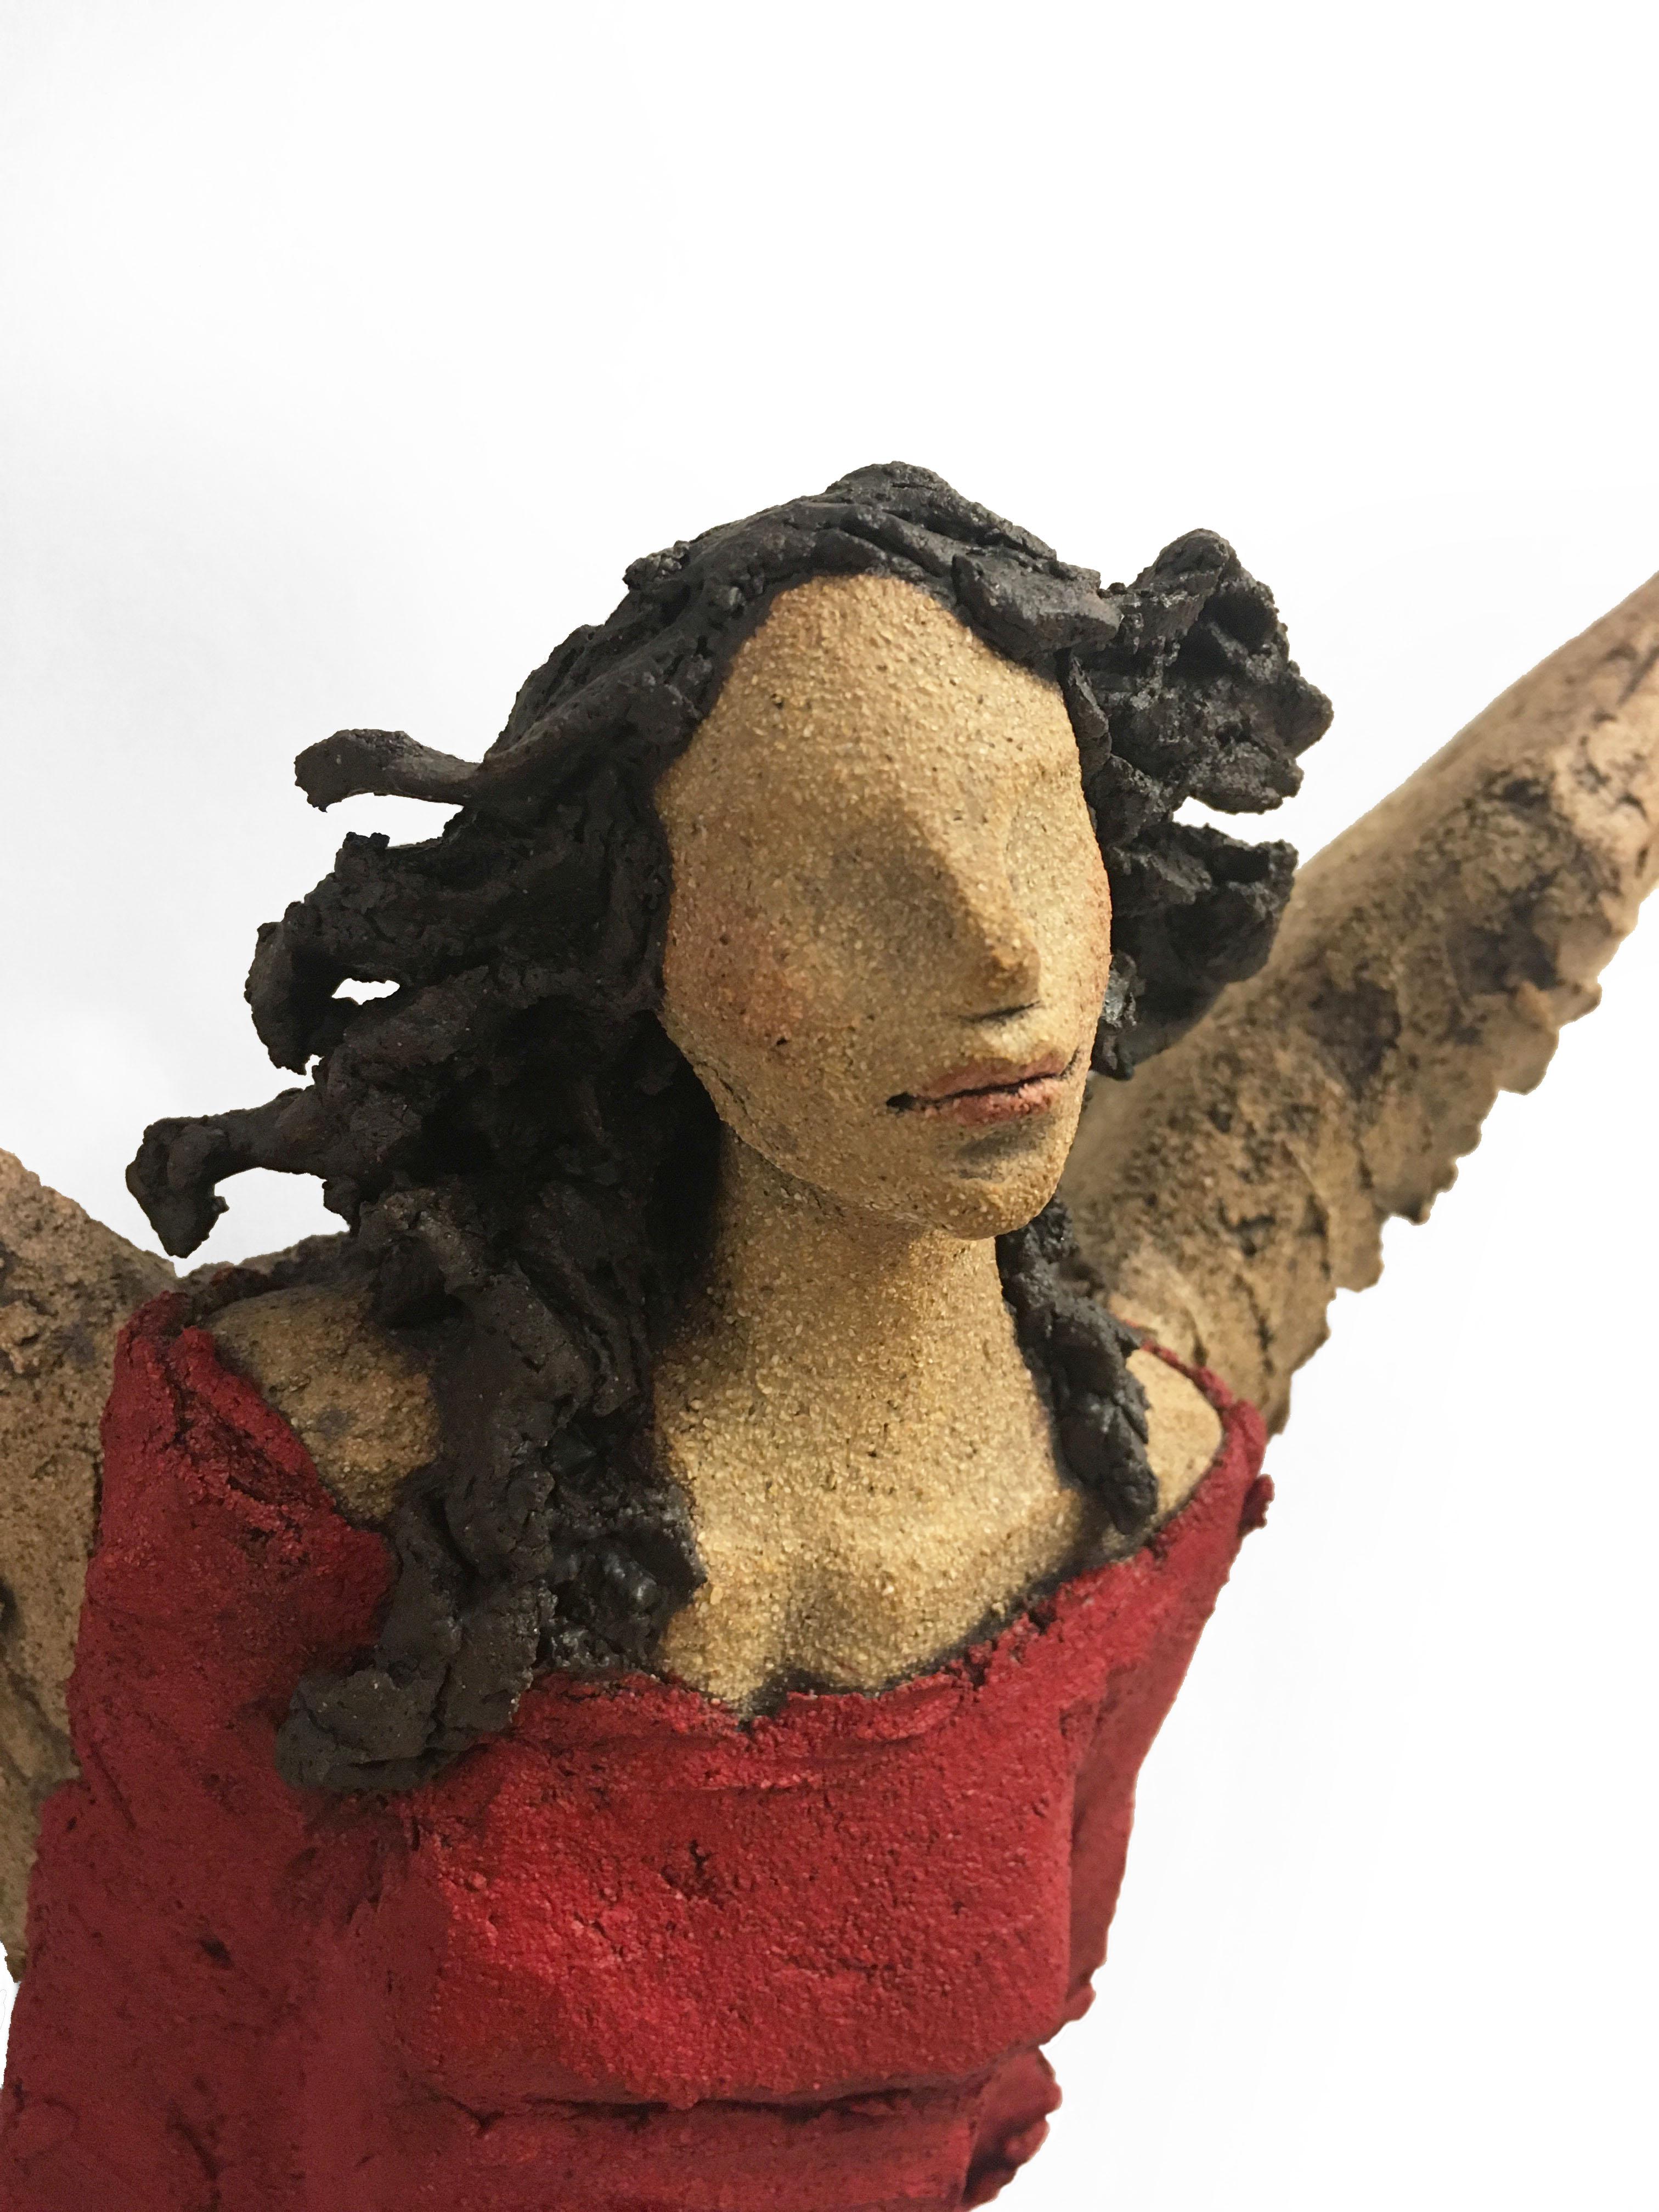 rød engel Ingun Dahlin keramikk skulptur